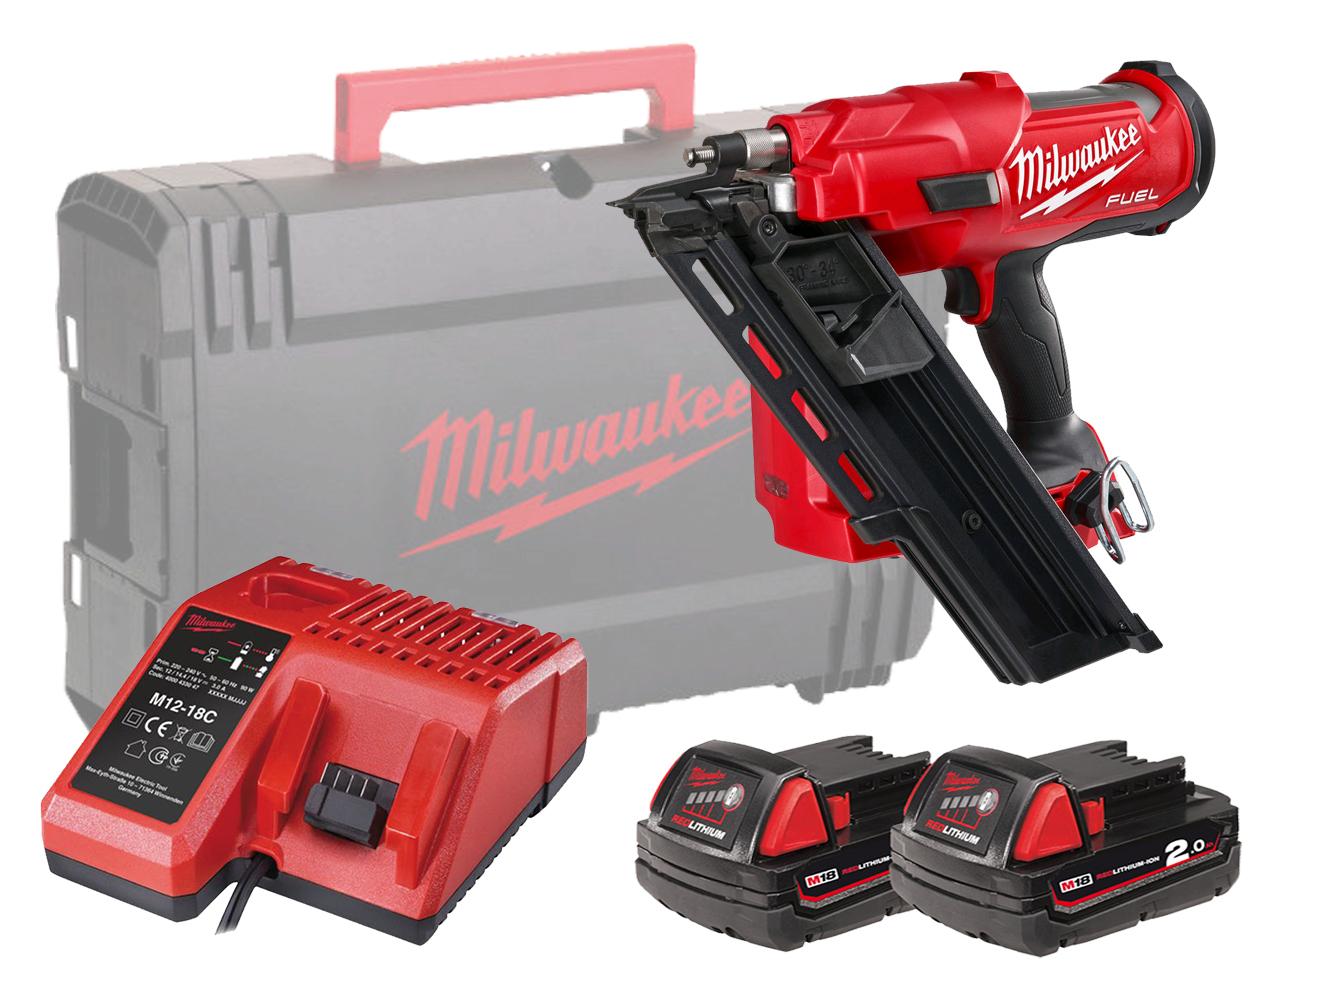 Milwaukee M18FFN 18V Fuel Framing Nailer (1St Fix Nail Gun) Gasless - 2.0Ah Pack